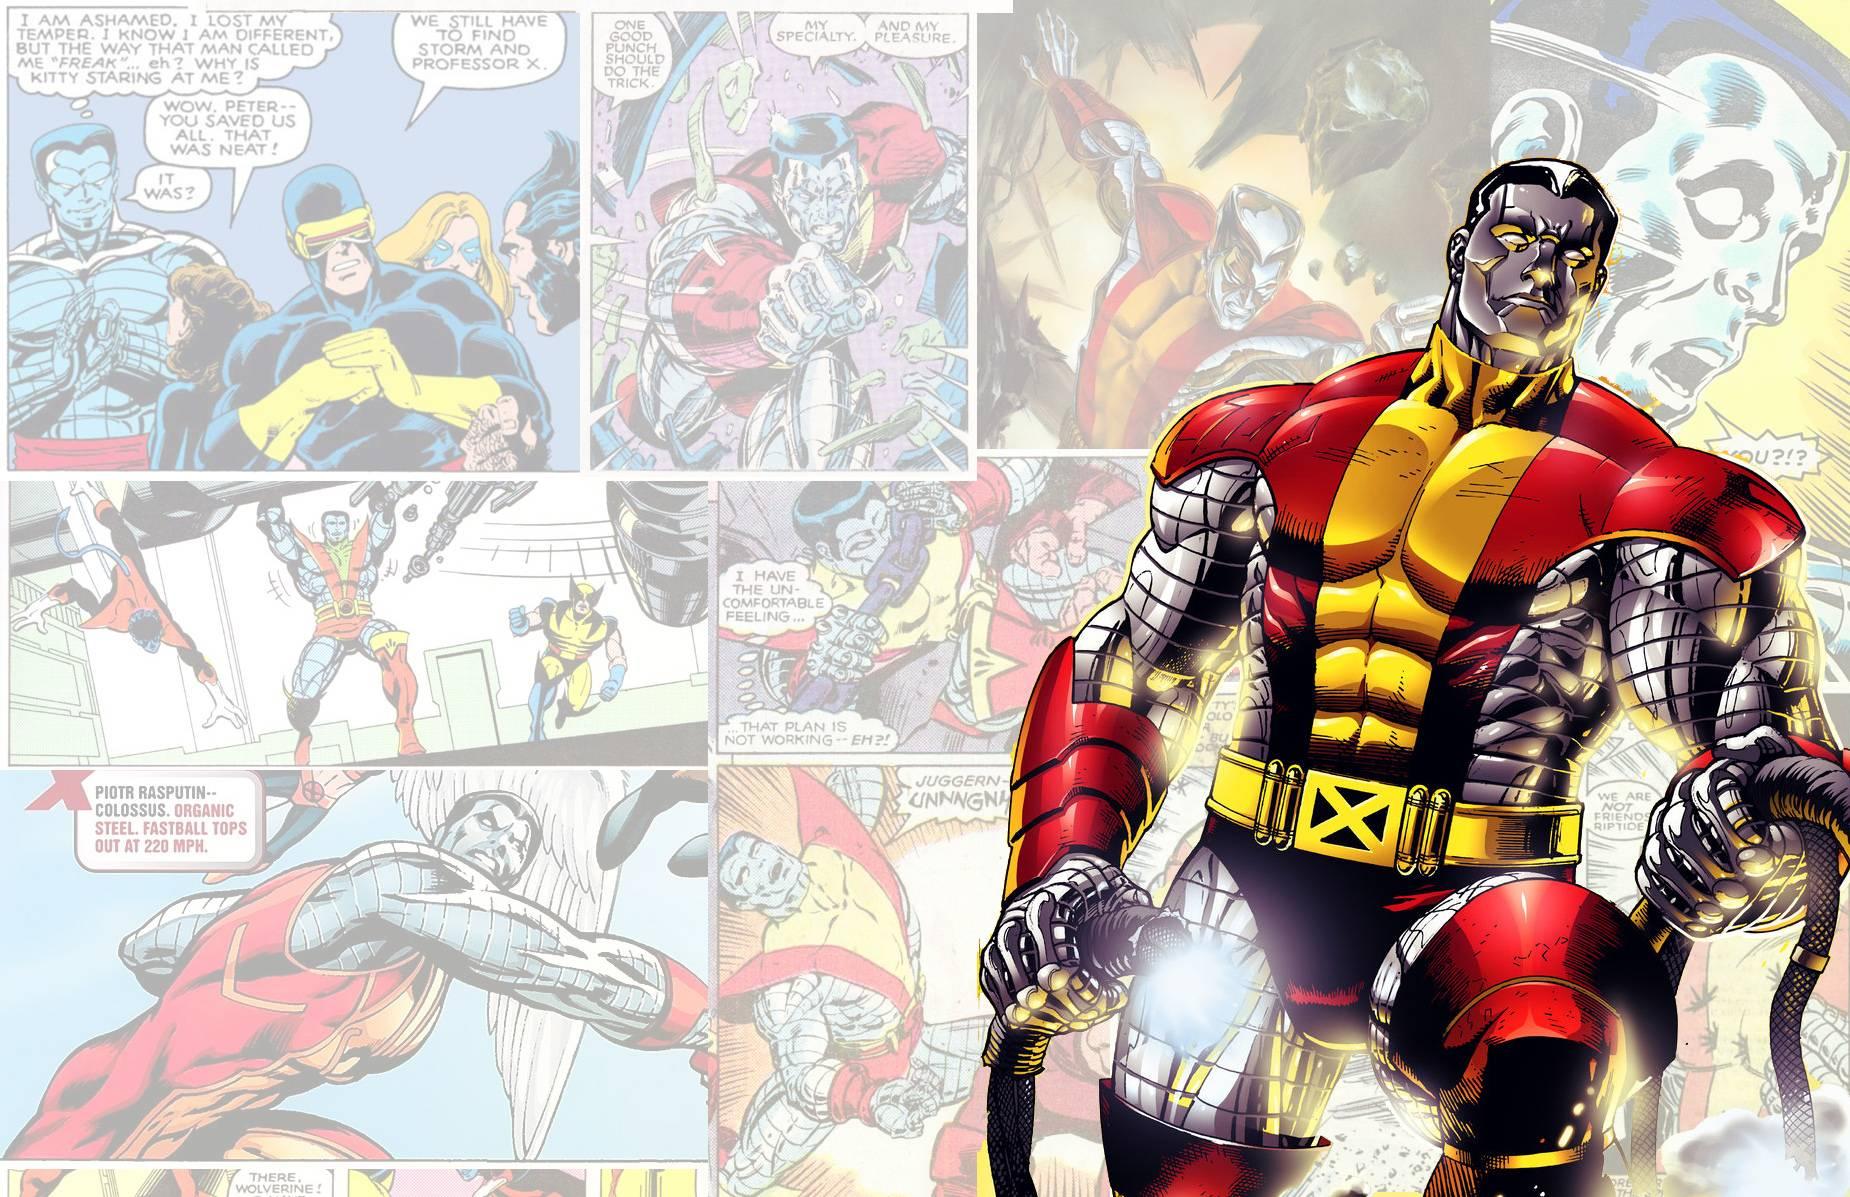 Colossus Marvel X Men Wallpaper 1850x1197 52093 Wallpaperup